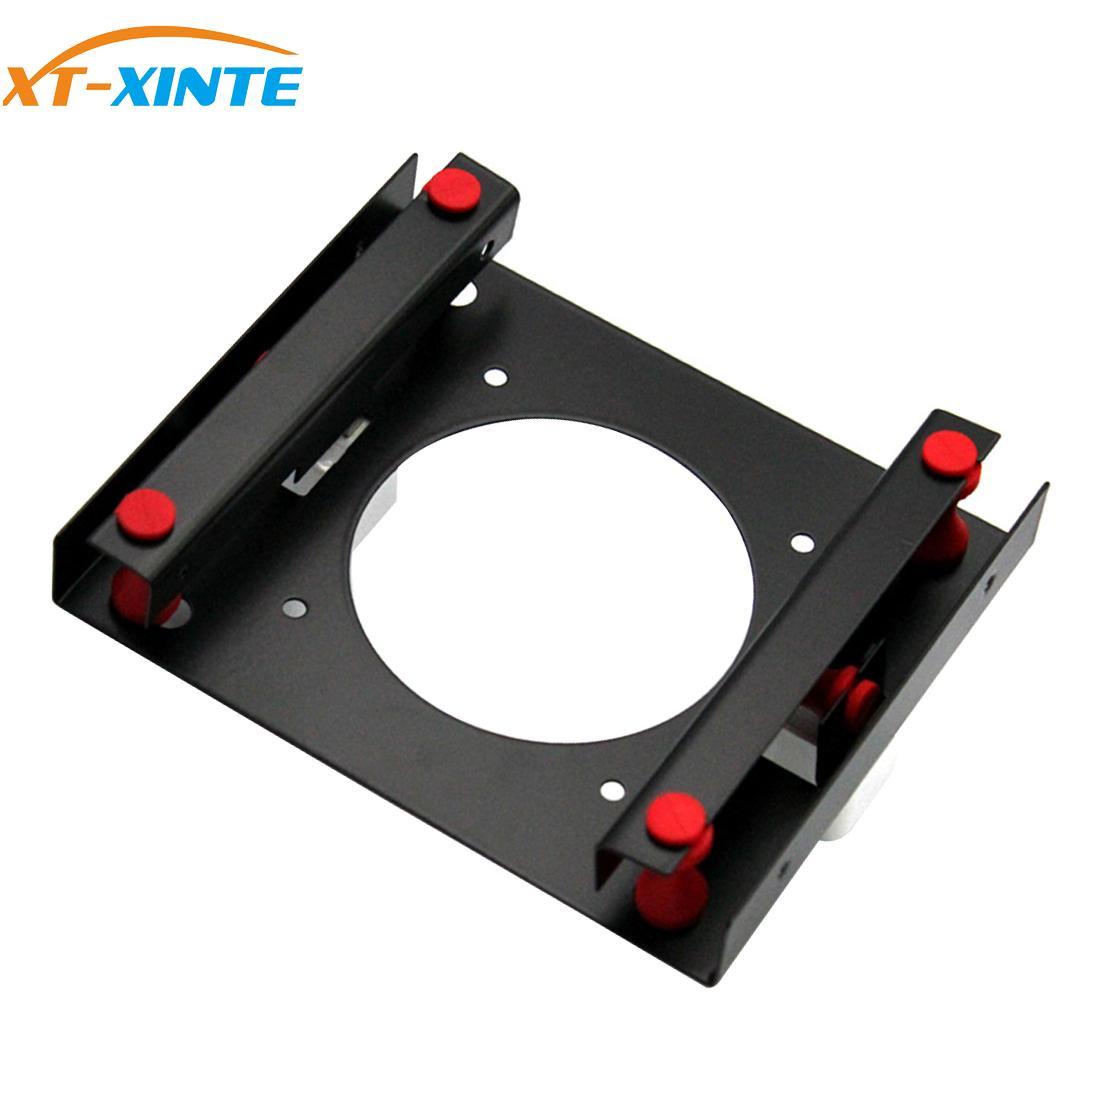 XT-XINTE Hard Disk Shock Absorber Bracket HDD SSD Converter Bracket Converts 3.5 To 5.25 Inch Hard Drive Bay Mounting Bracket